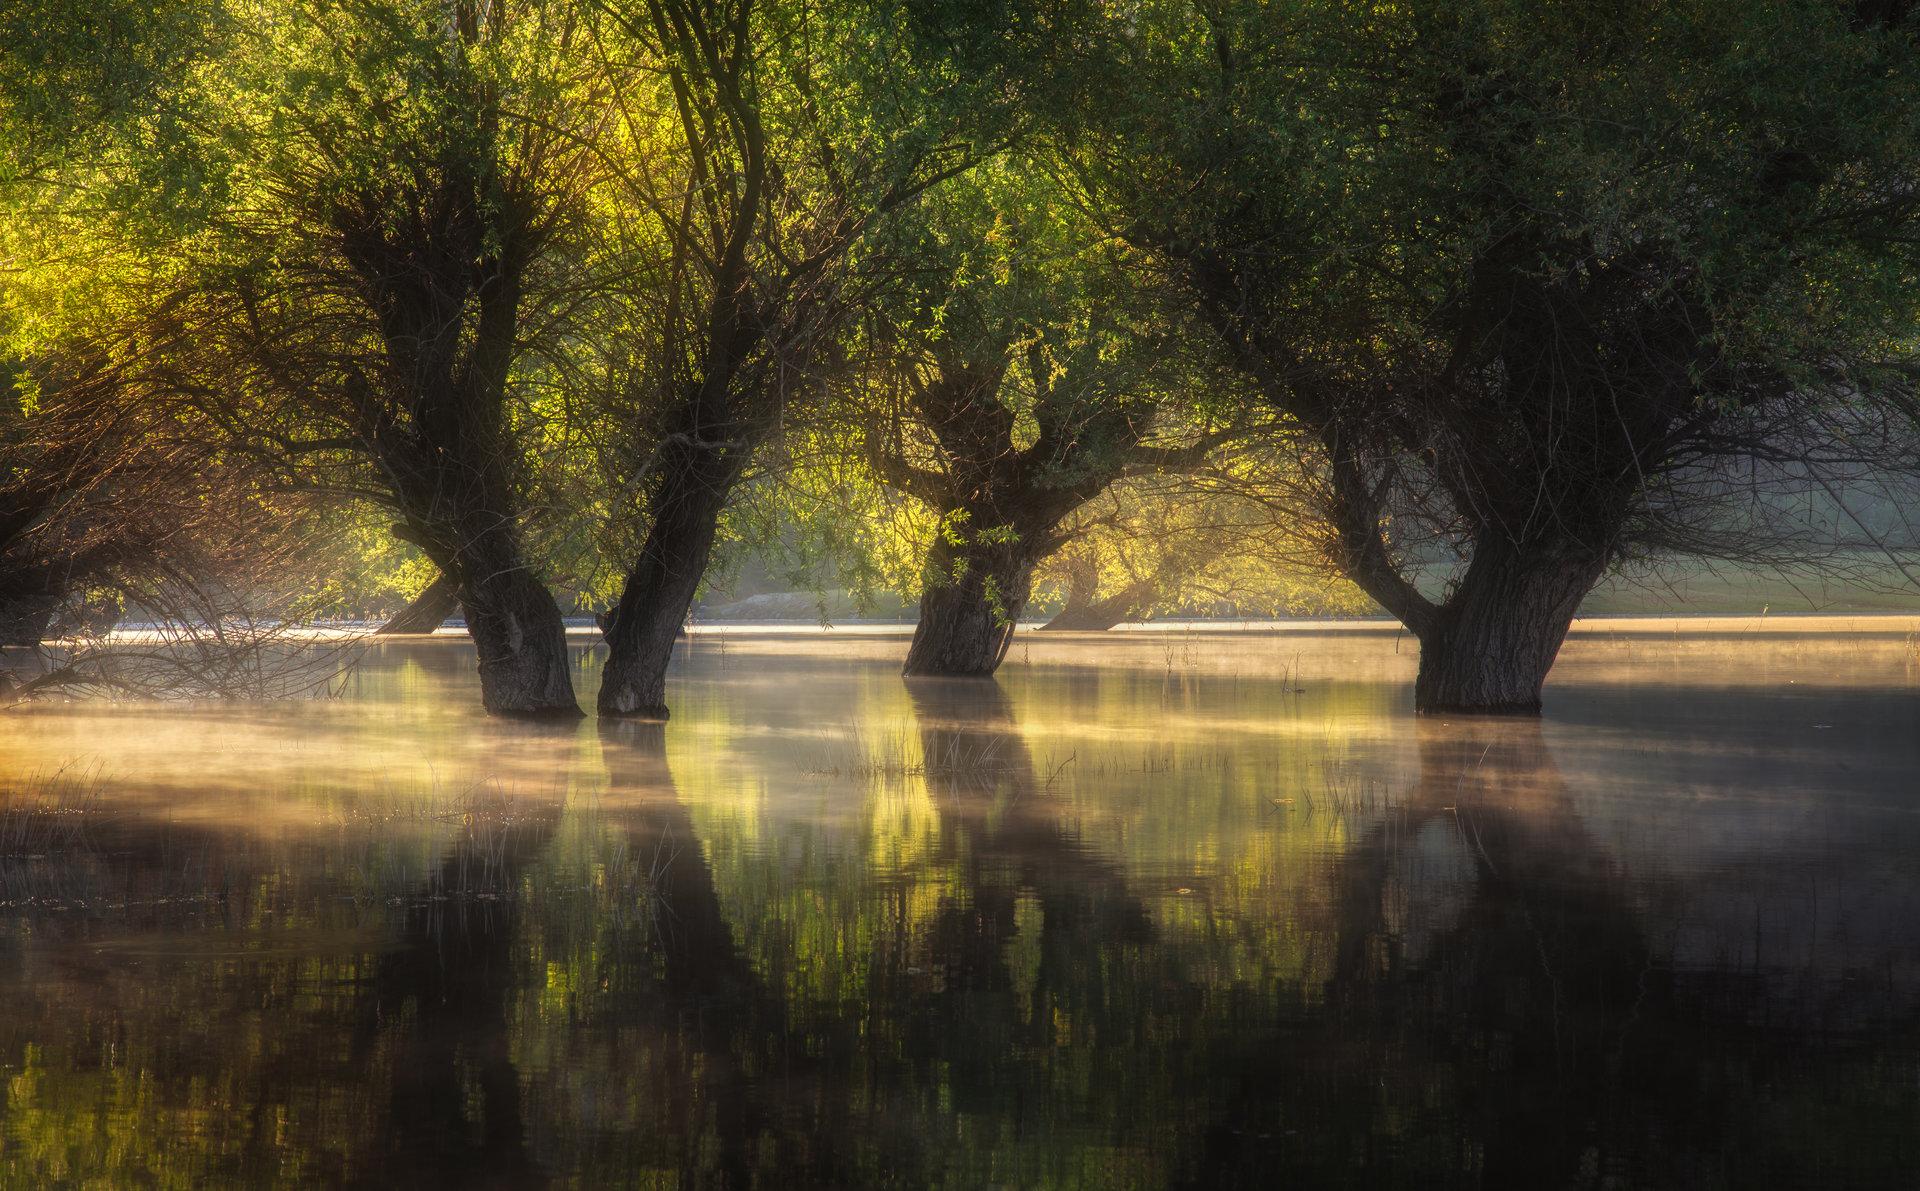 Photo in Landscape | Author Динко Шаханов - dinko8708 | PHOTO FORUM